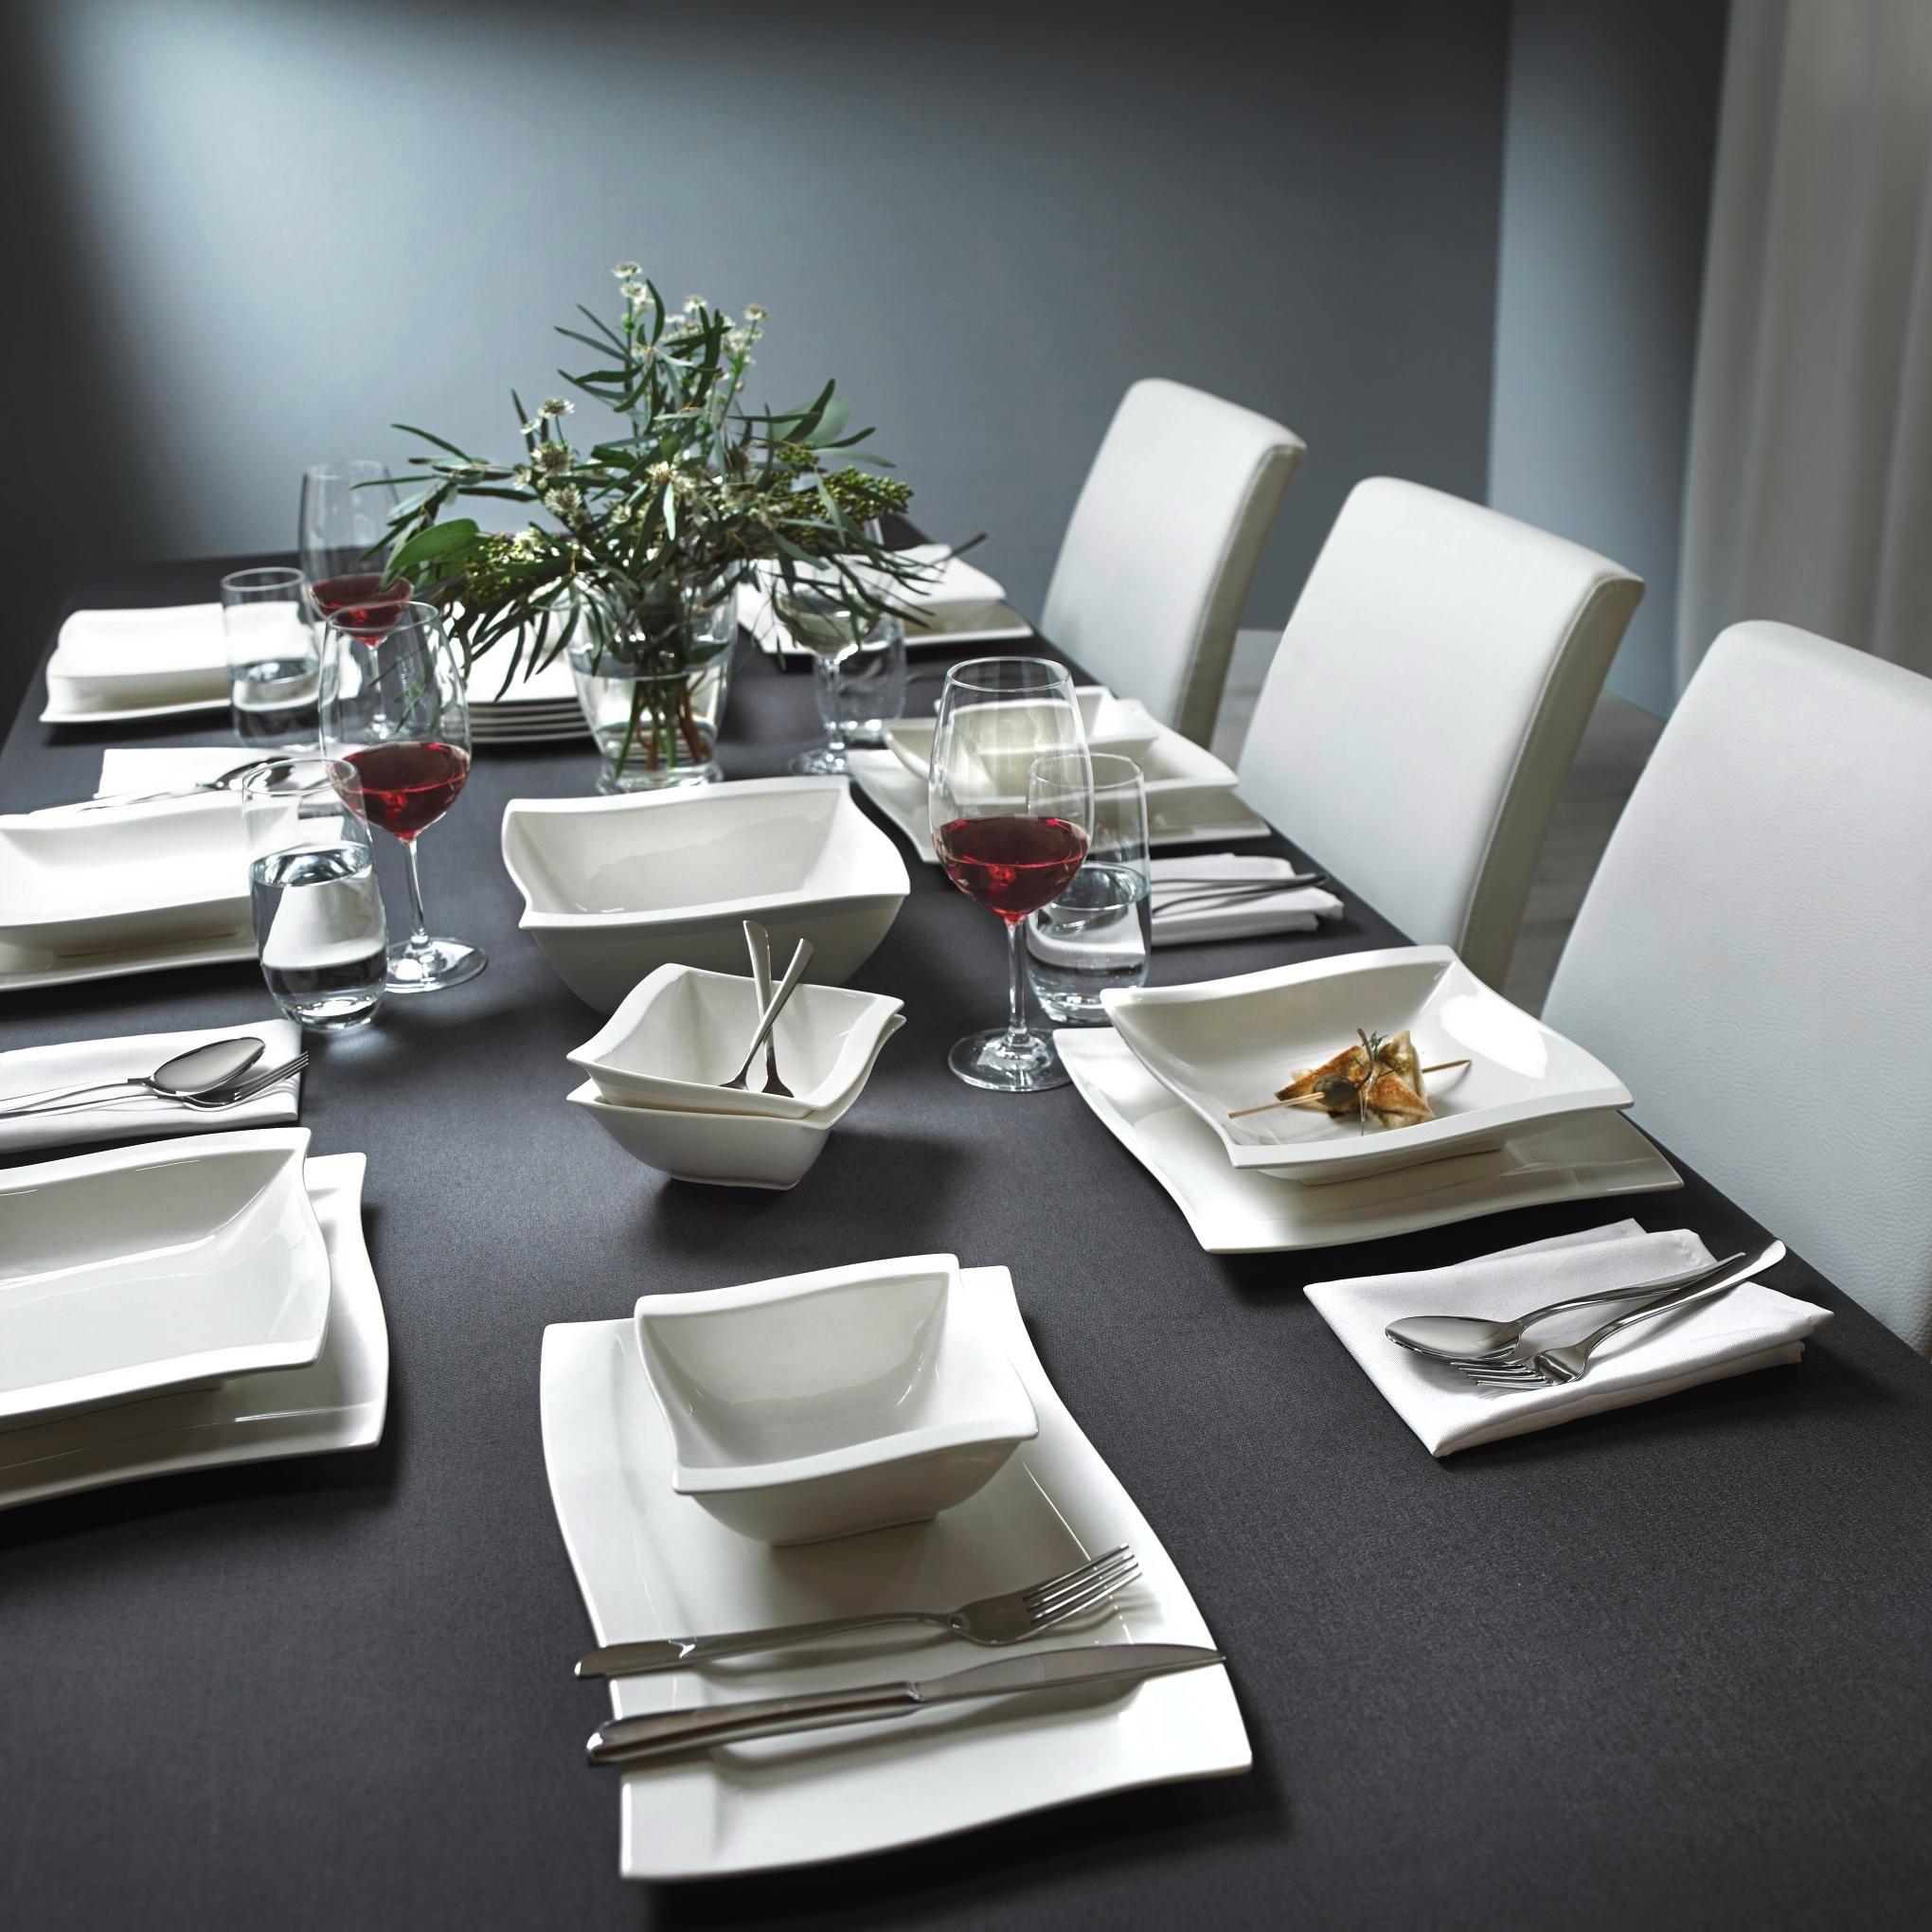 tafelservice in wei swing quadratisch in edlem design. Black Bedroom Furniture Sets. Home Design Ideas